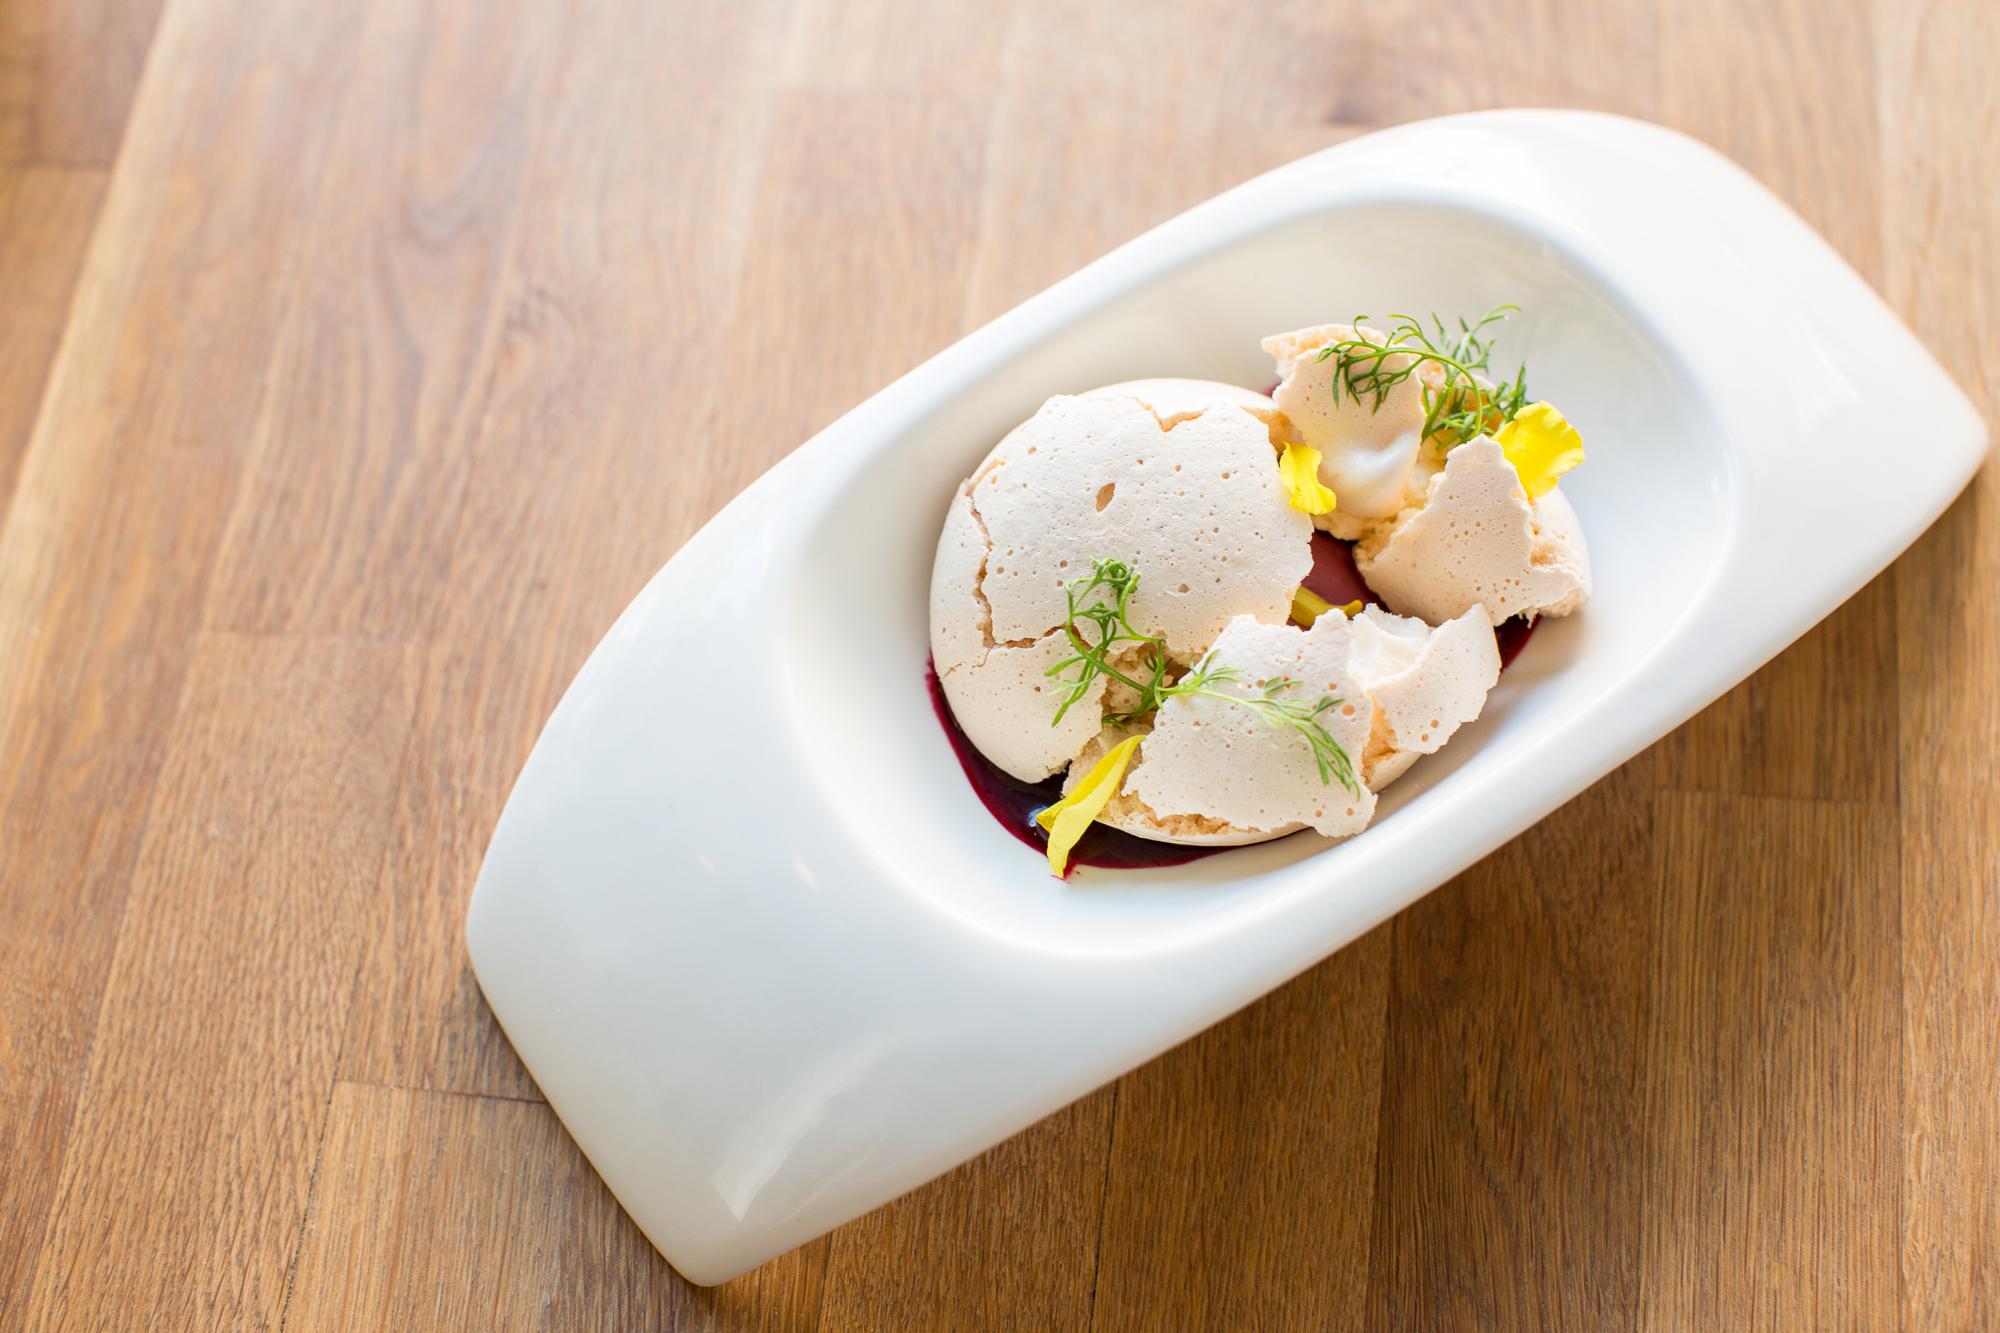 mountain huckleberry   vanilla meringue/yuzu/devilwood consomme